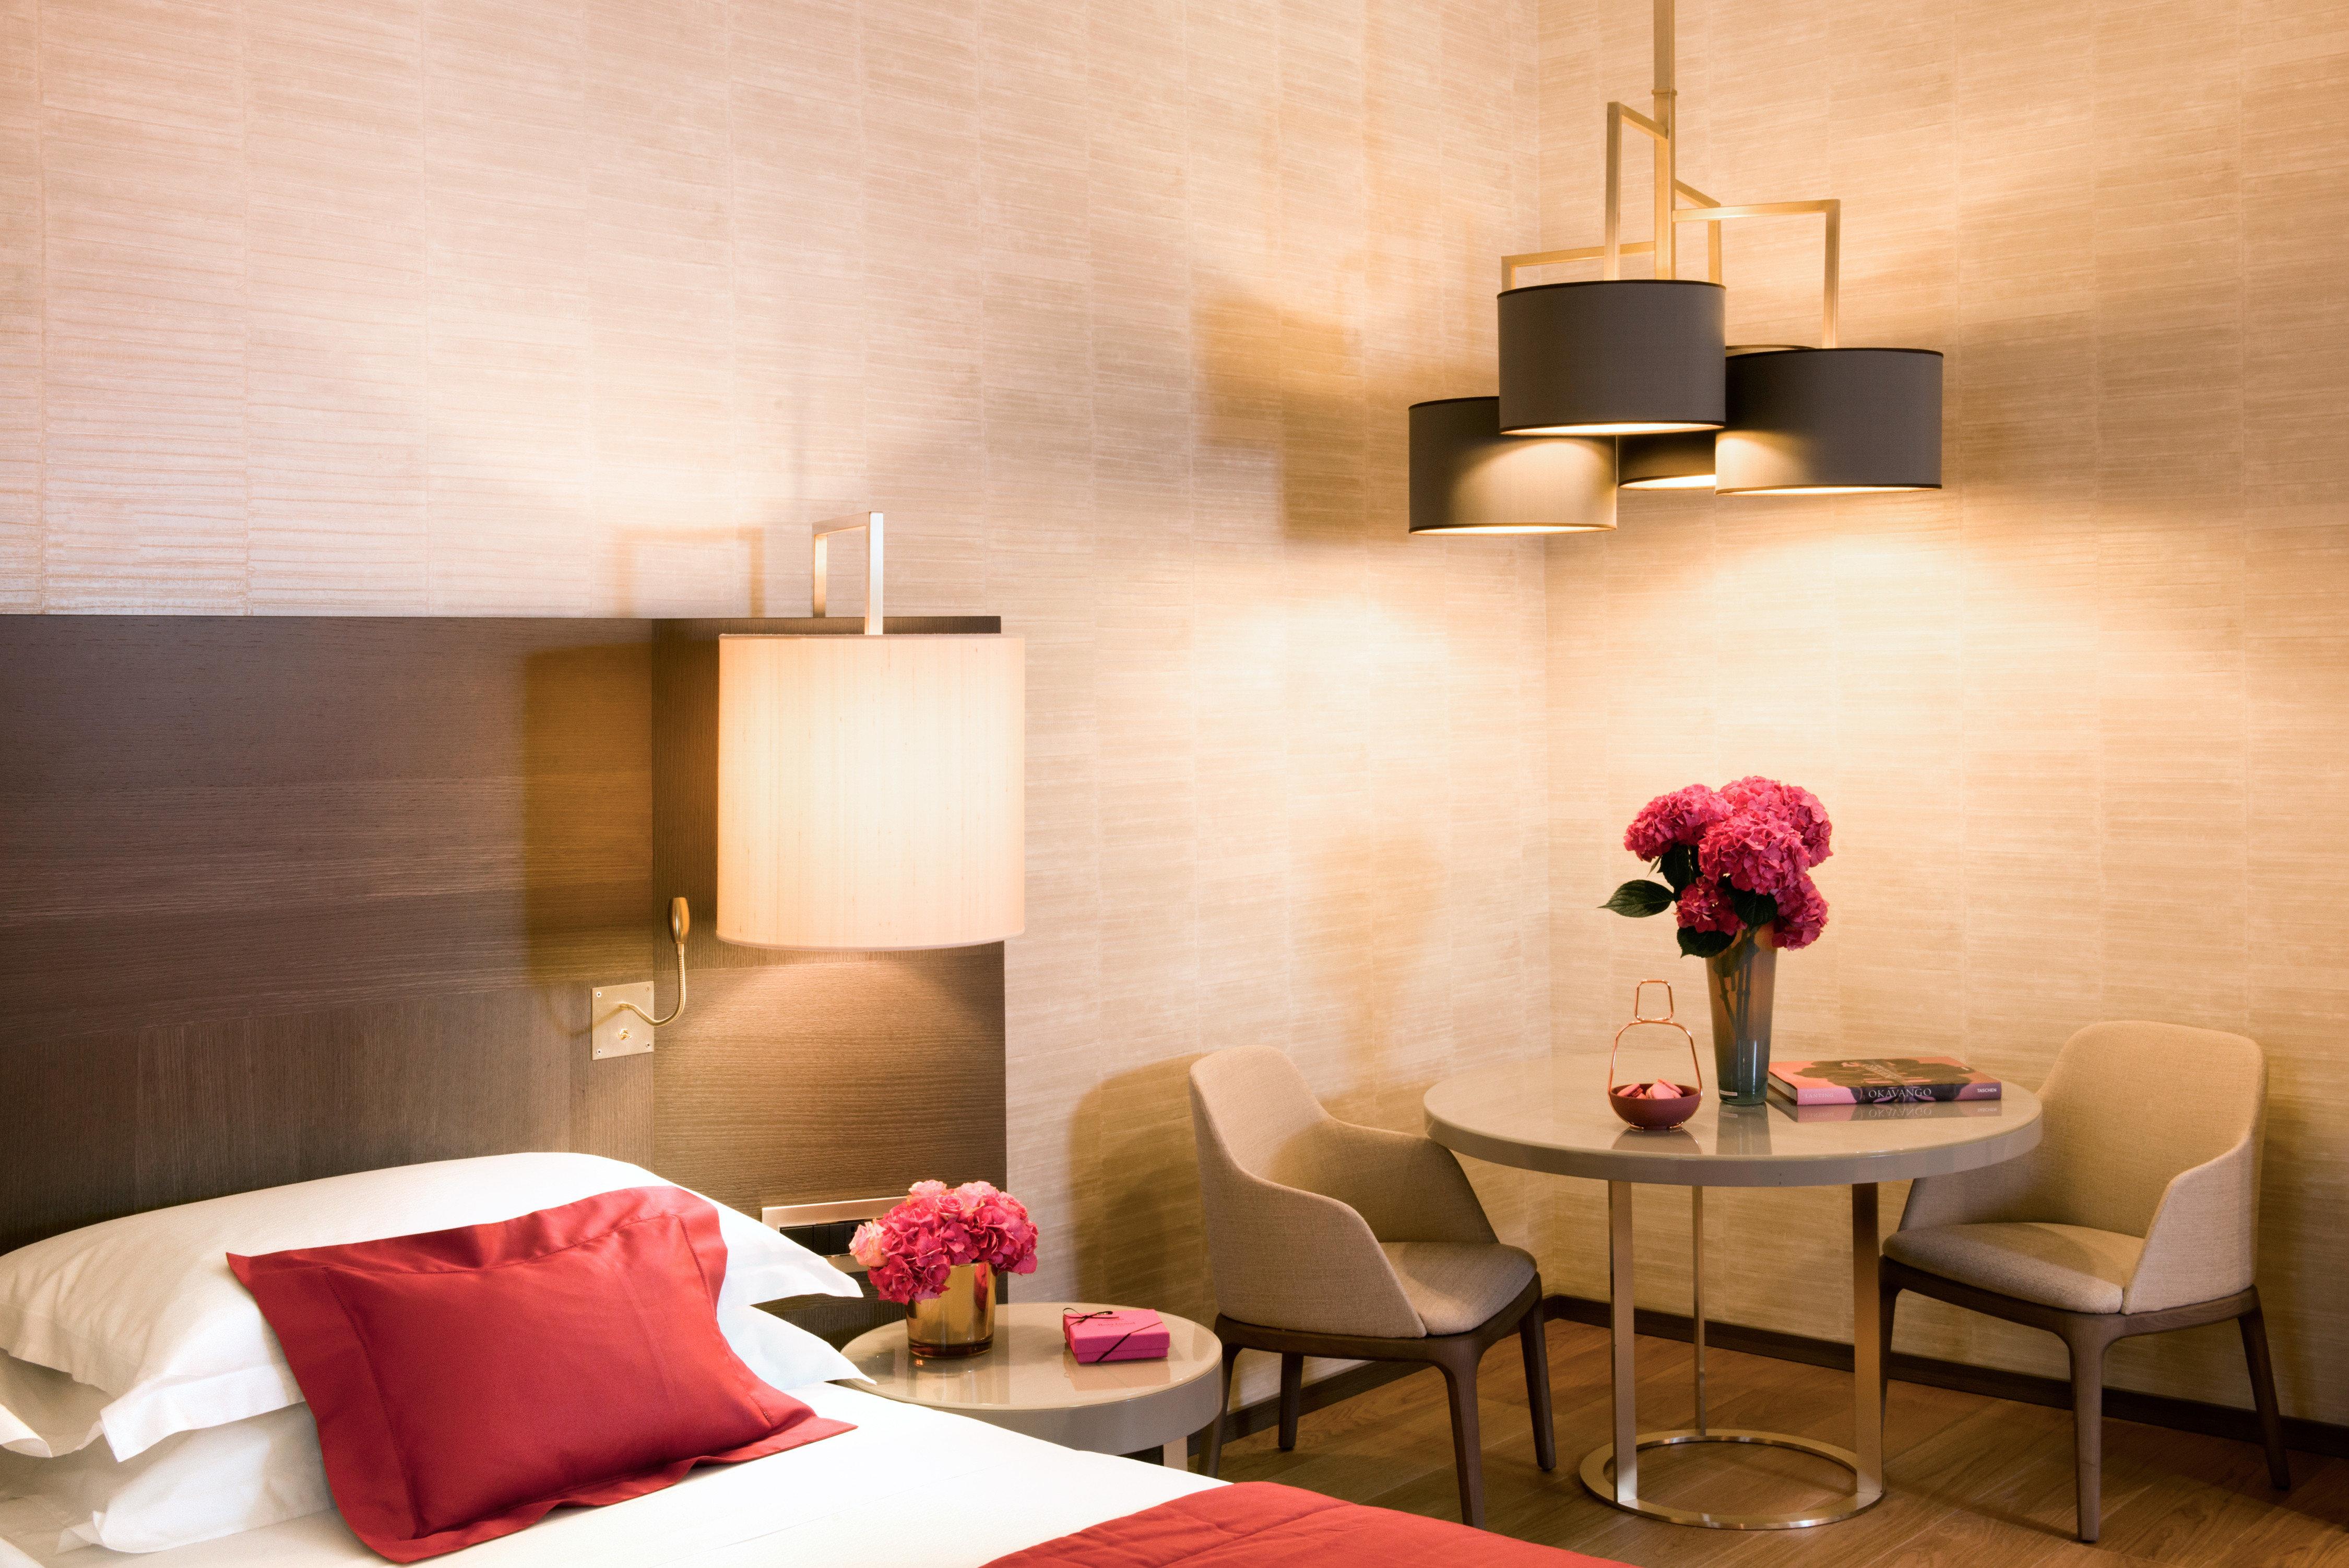 Bedroom red property Suite living room lighting lamp